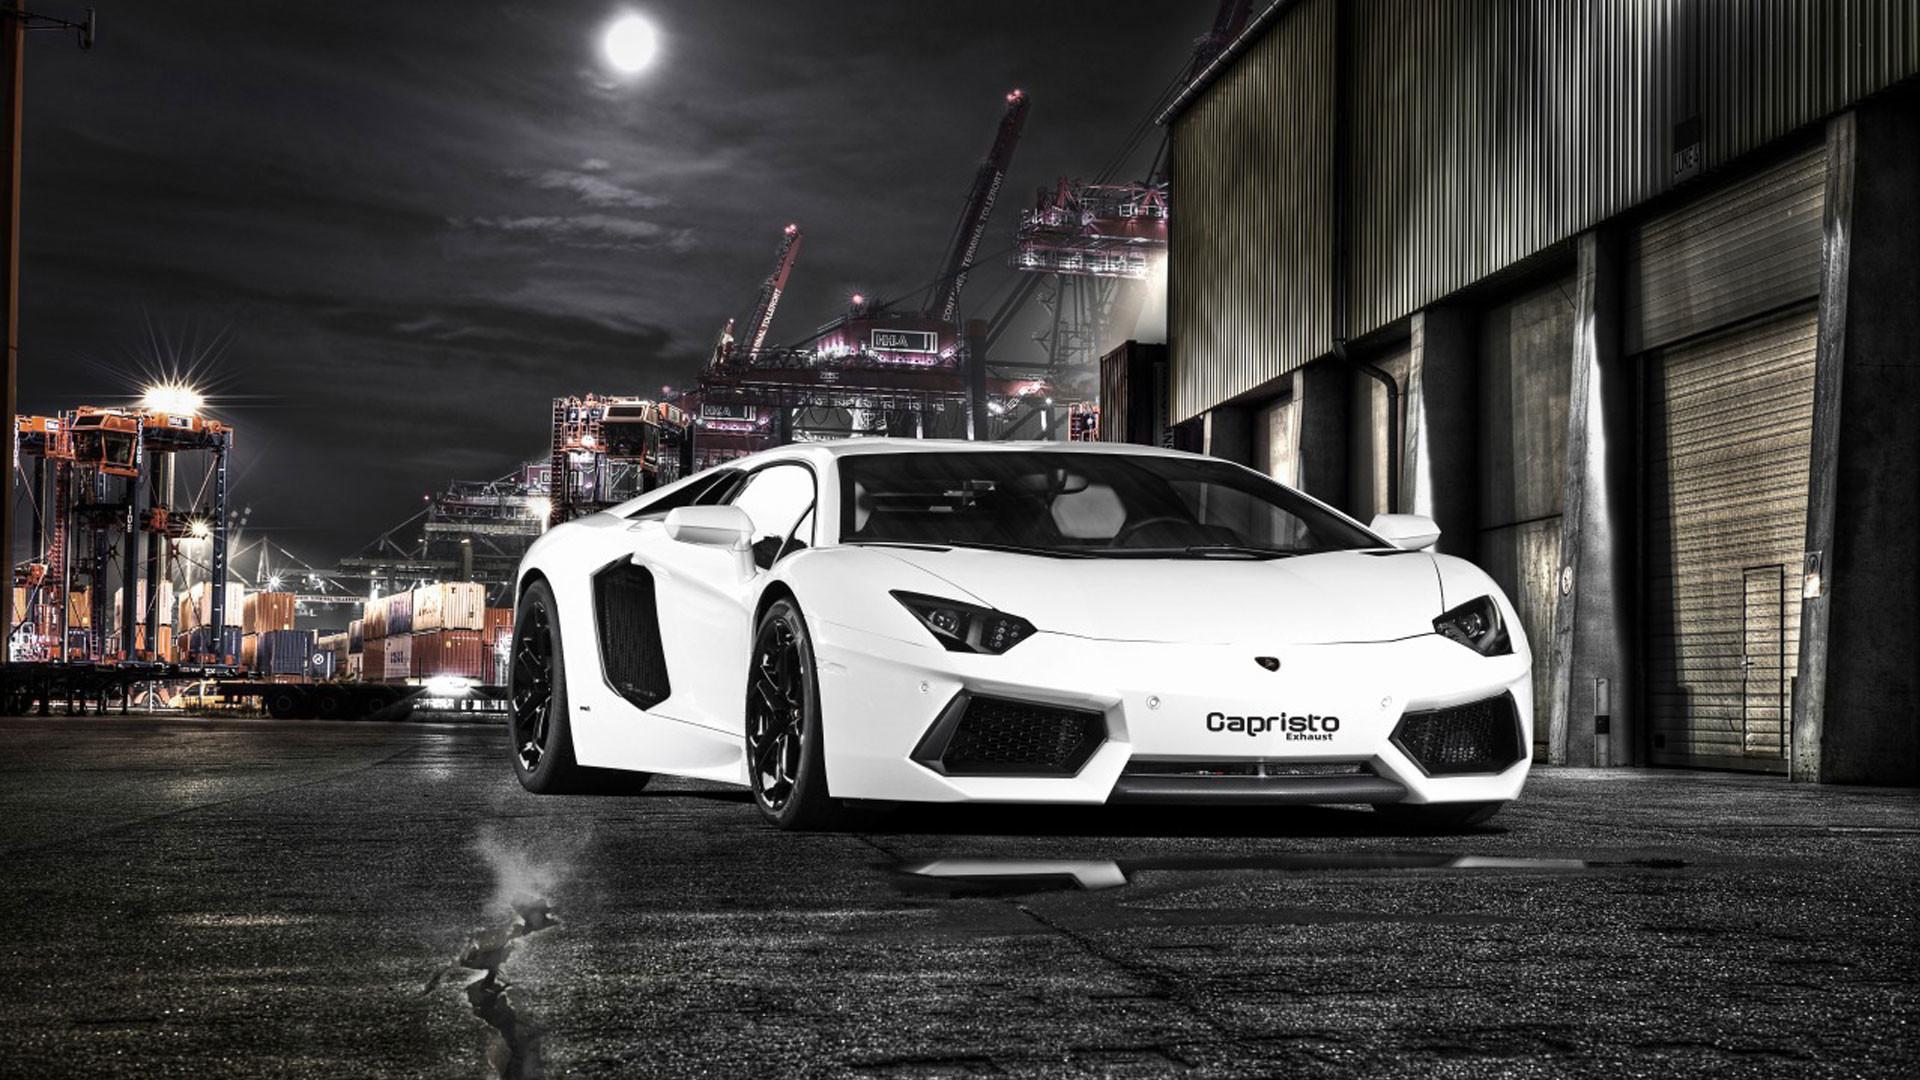 Cool Lamborghini Wallpapers 63 Pictures